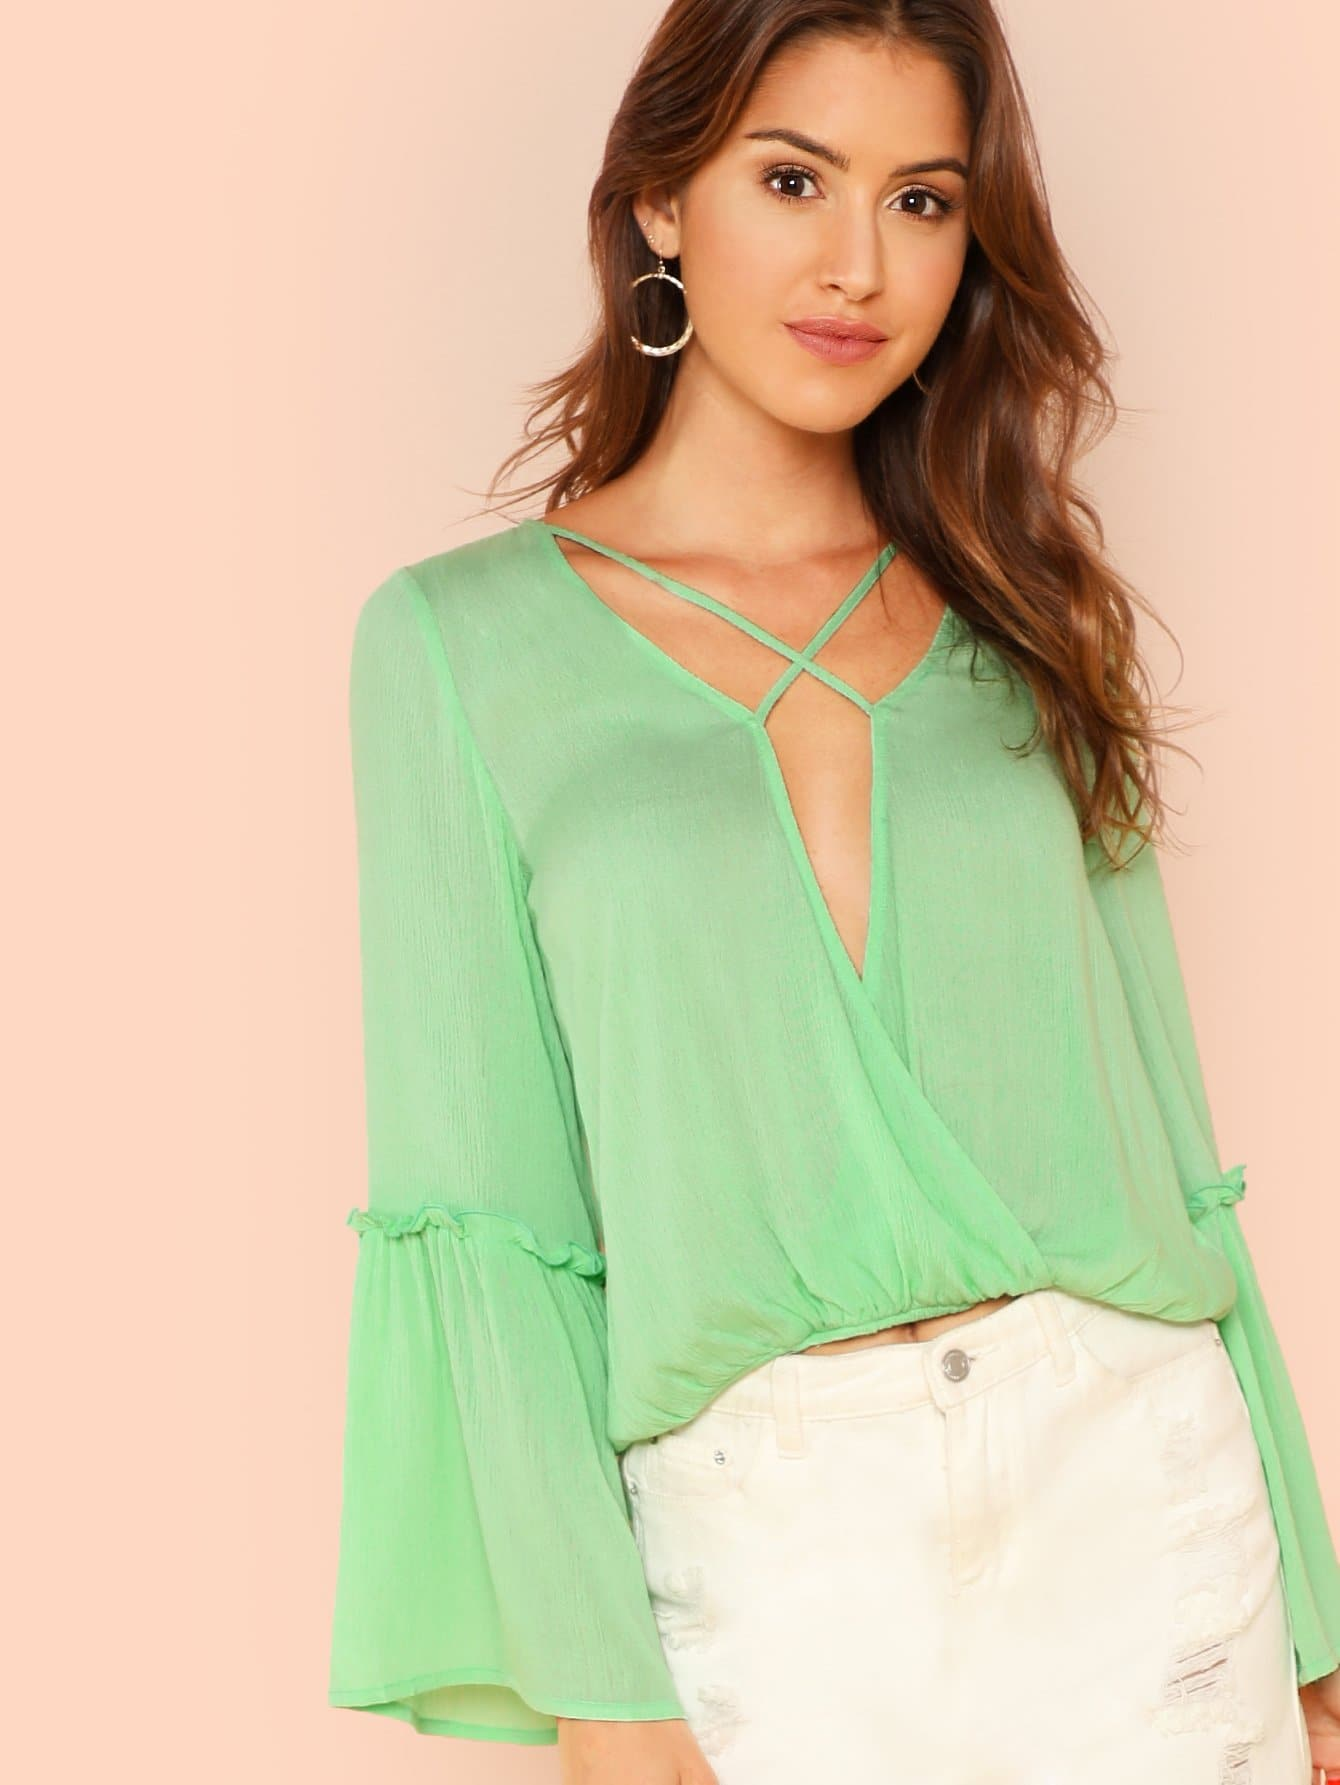 Купить Рубашка с коротким рукавом, Gigi Paris, SheIn